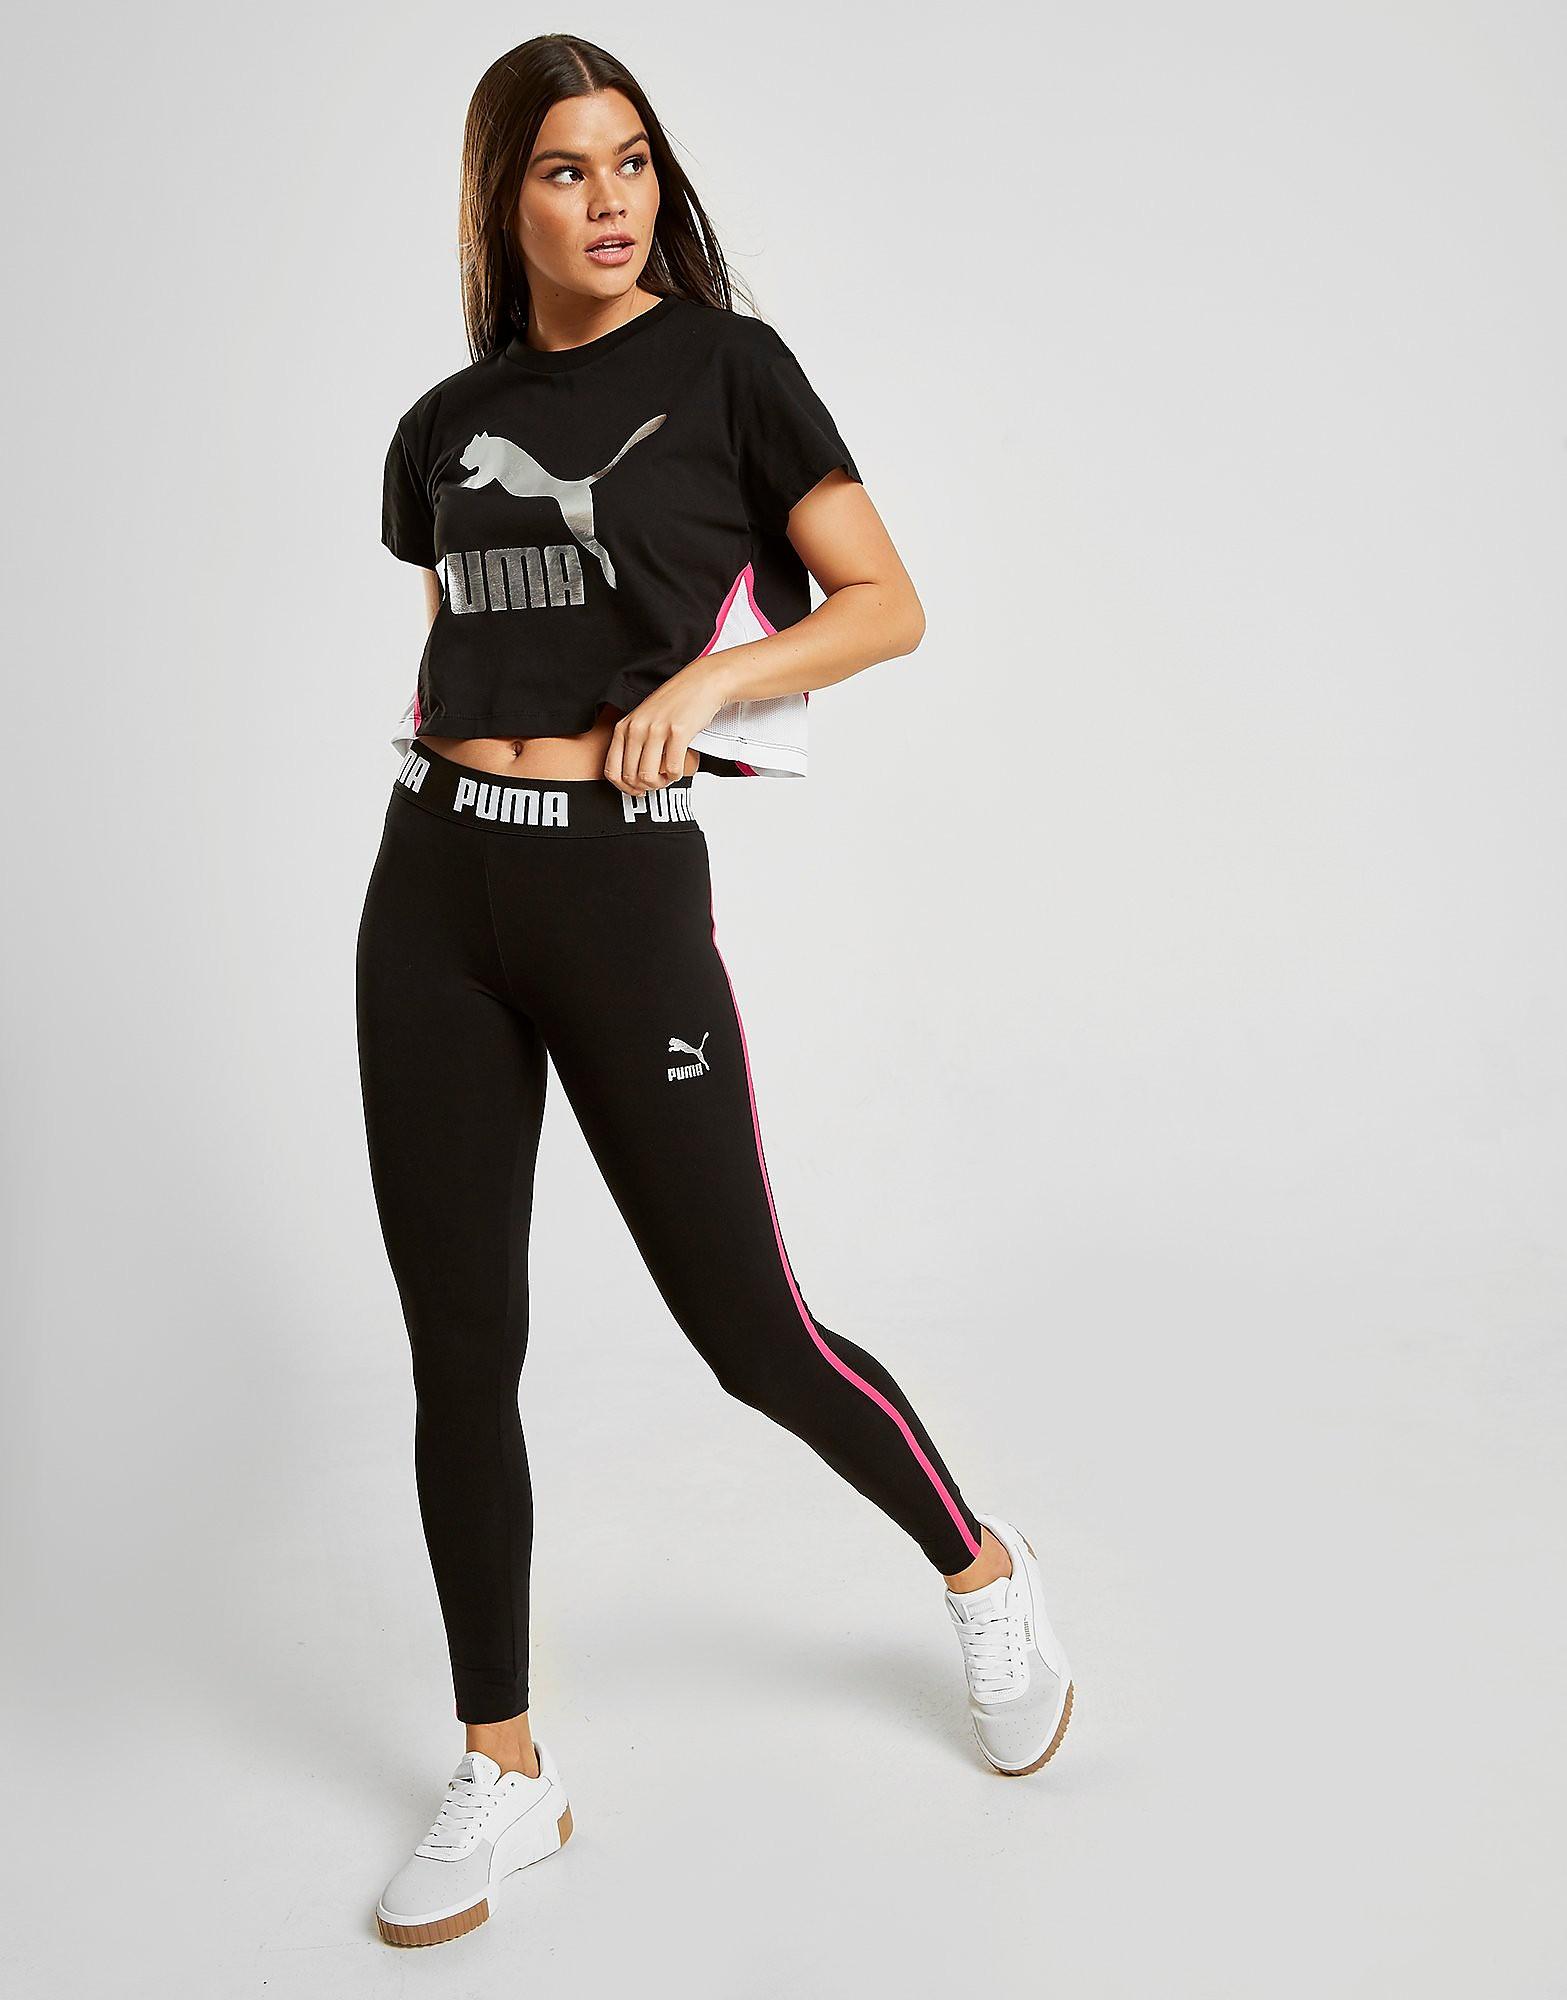 PUMA Jogginghose Damen - Only at JD - Schwarz - Womens, Schwarz